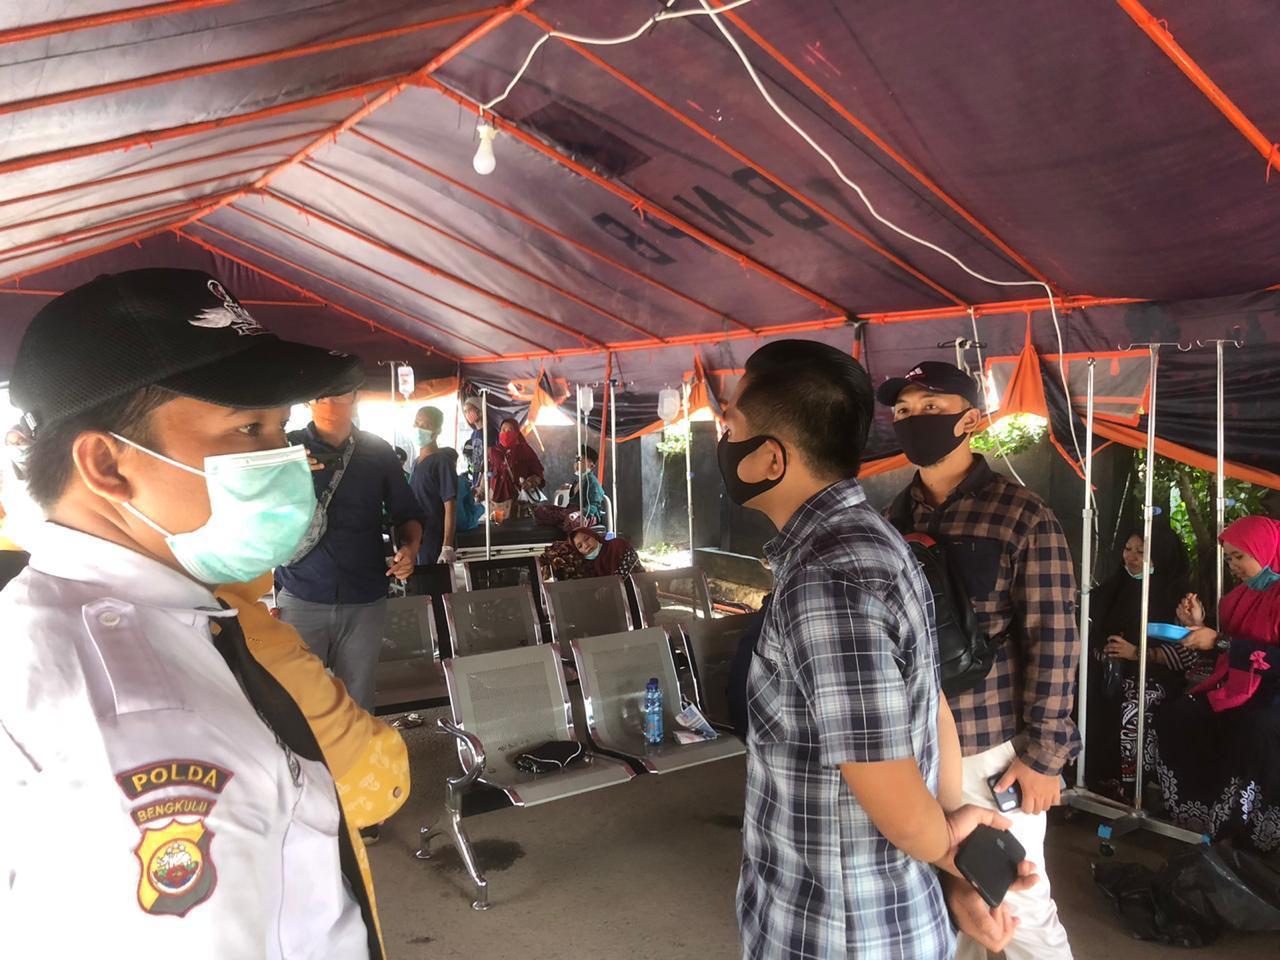 50 Santri Keracunan Makanan, Polres Bengkulu Bersama Warga Lakukan Evakuasi